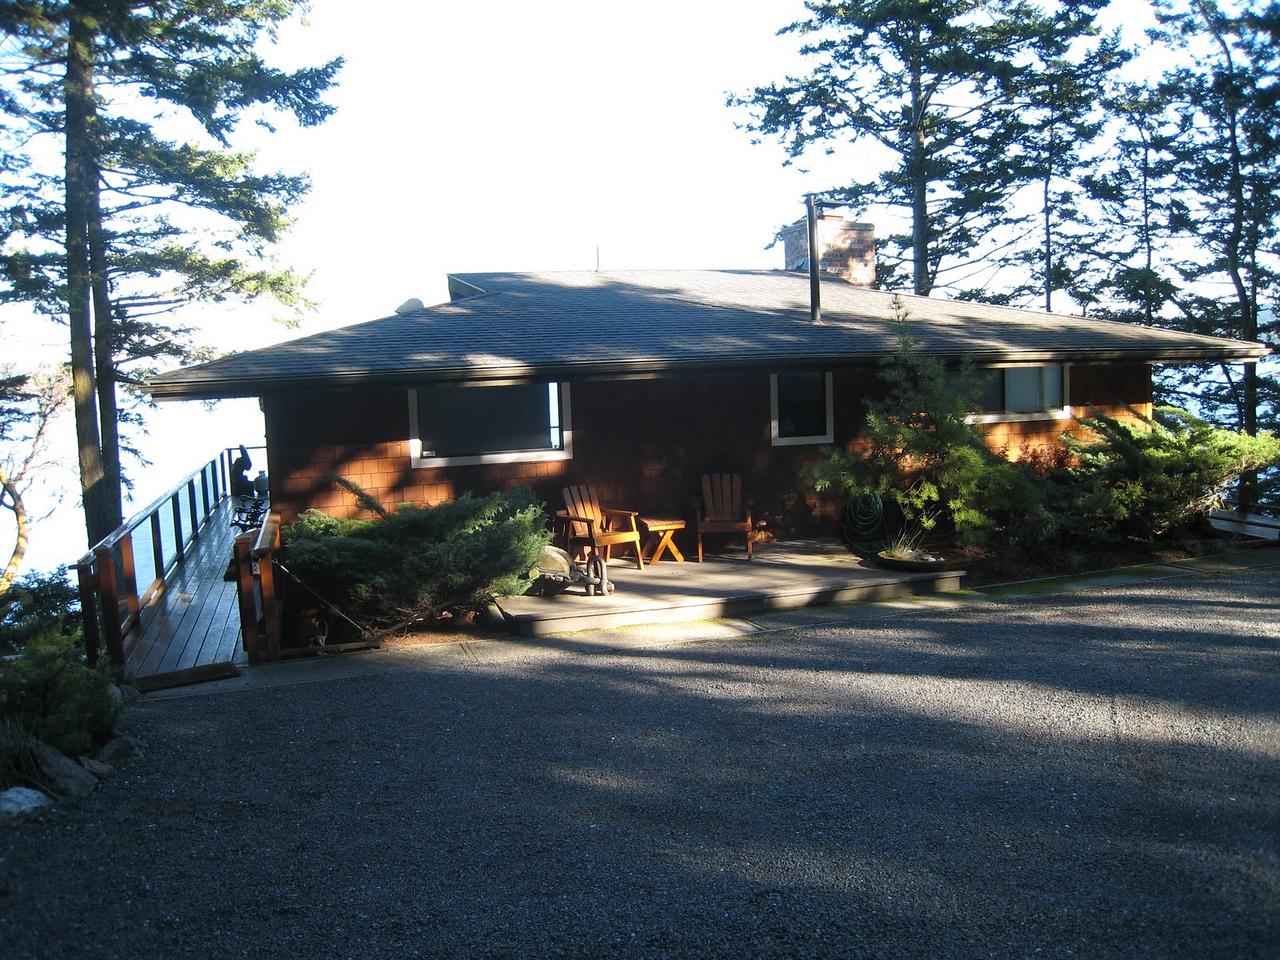 Robinson Cove house on San Juan Island